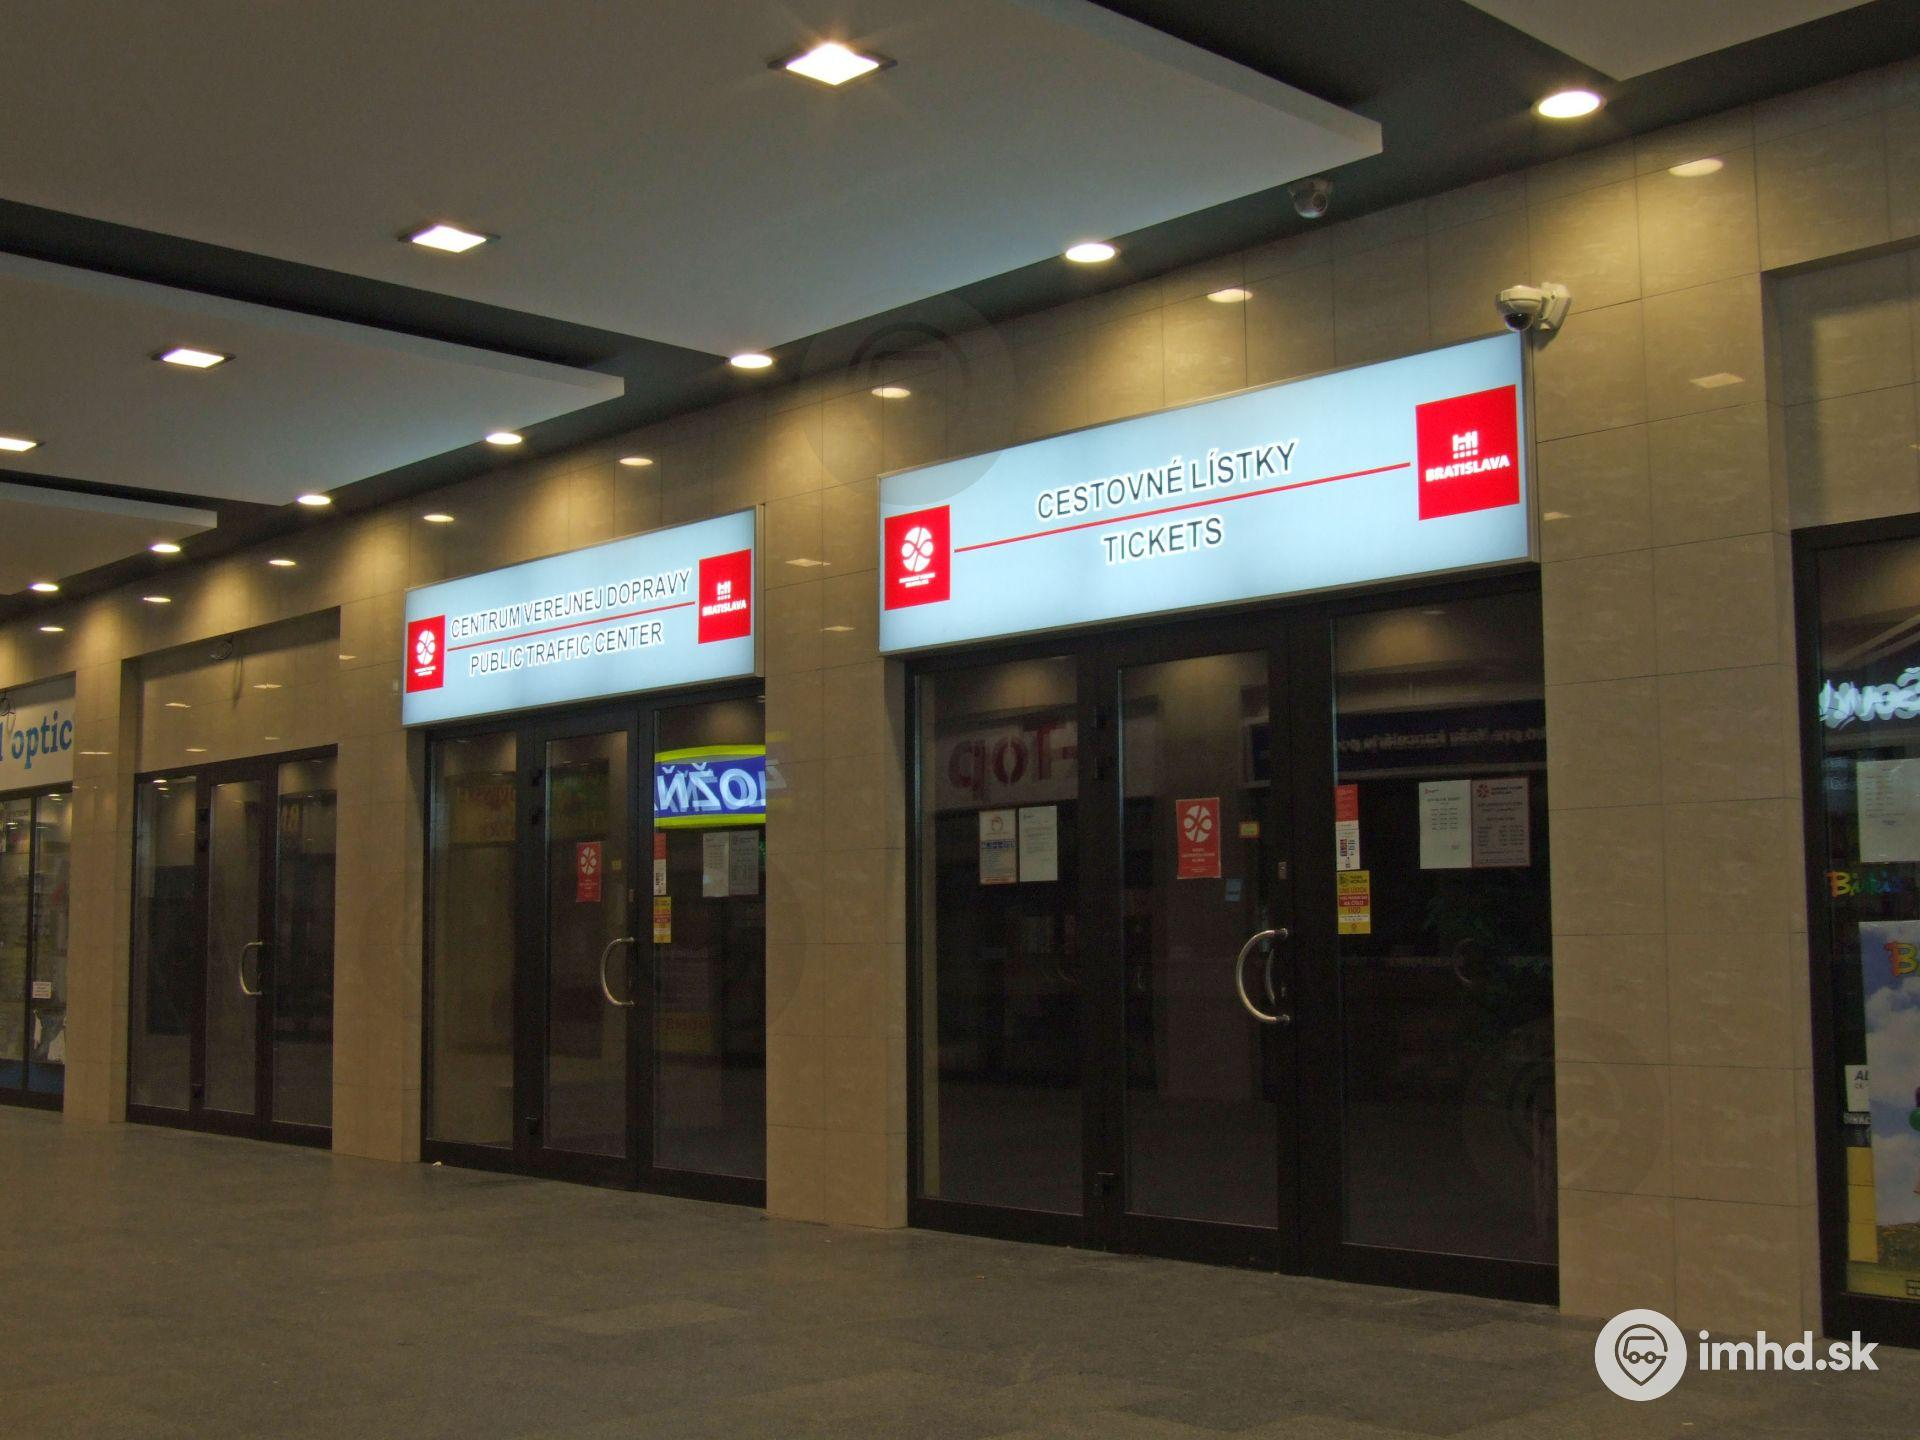 Ticket shops • imhd.sk Bratislava 9e49011baeb